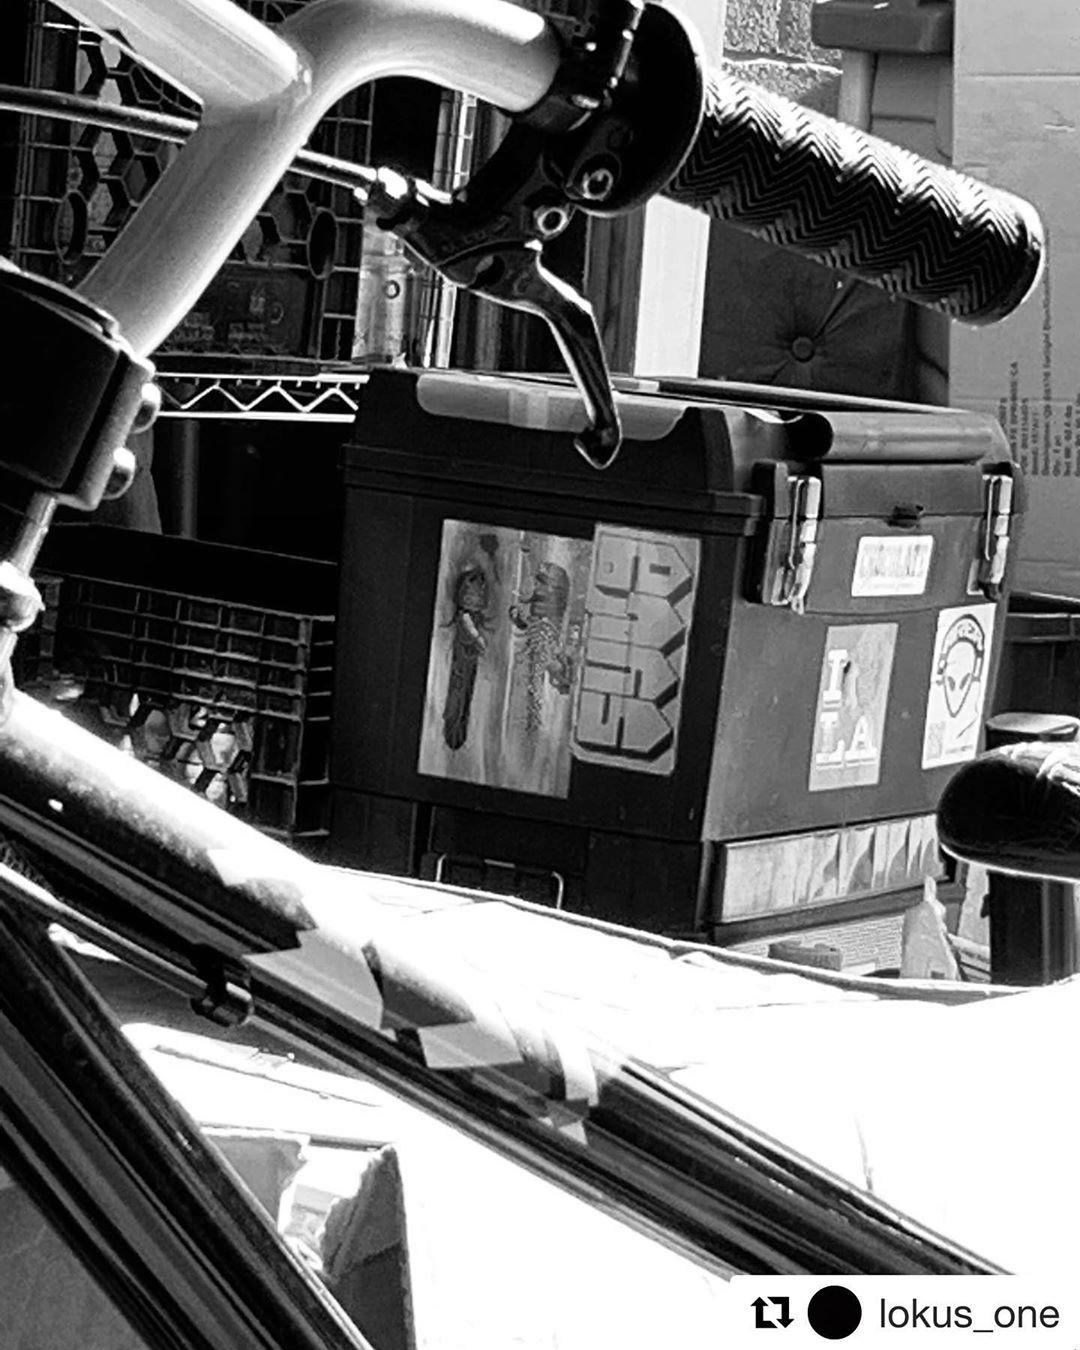 #Repost @lokus_one ・・・ #syla #area51 #IloveLA #giantbikes #51hiphop #flourispro... 1